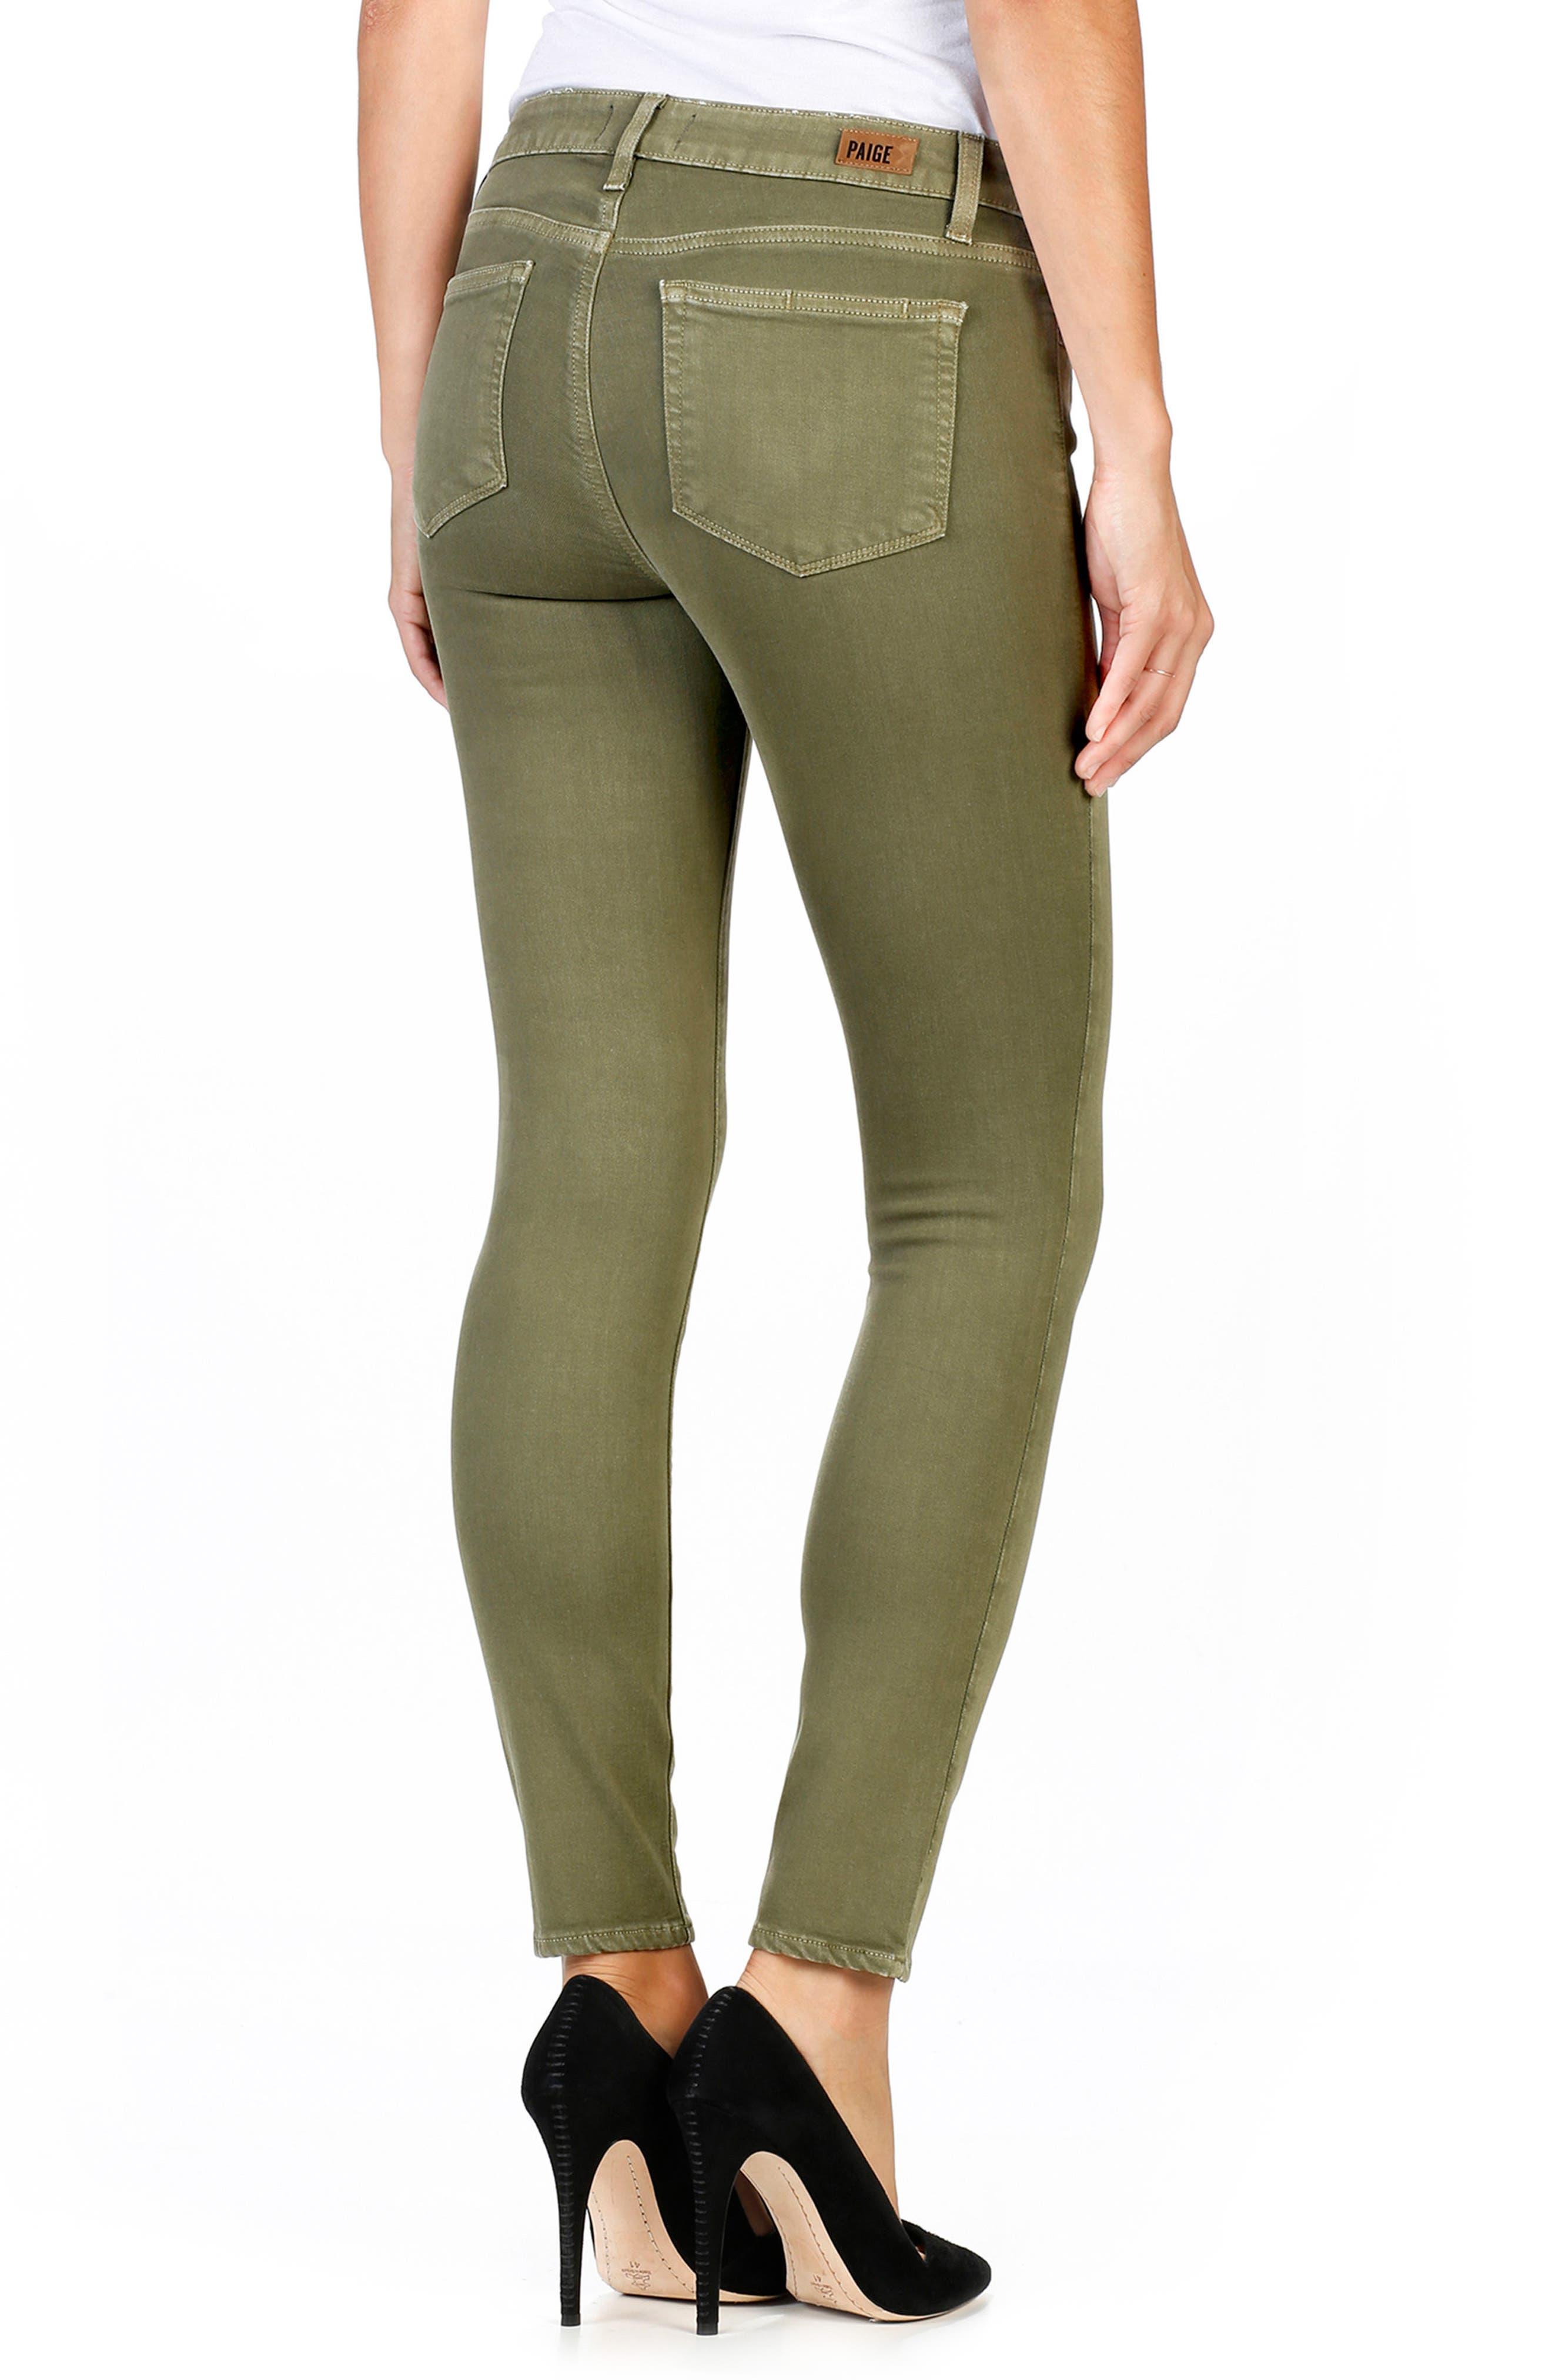 Transcend - Verdugo Ankle Skinny Jeans,                             Alternate thumbnail 2, color,                             Sahara Green